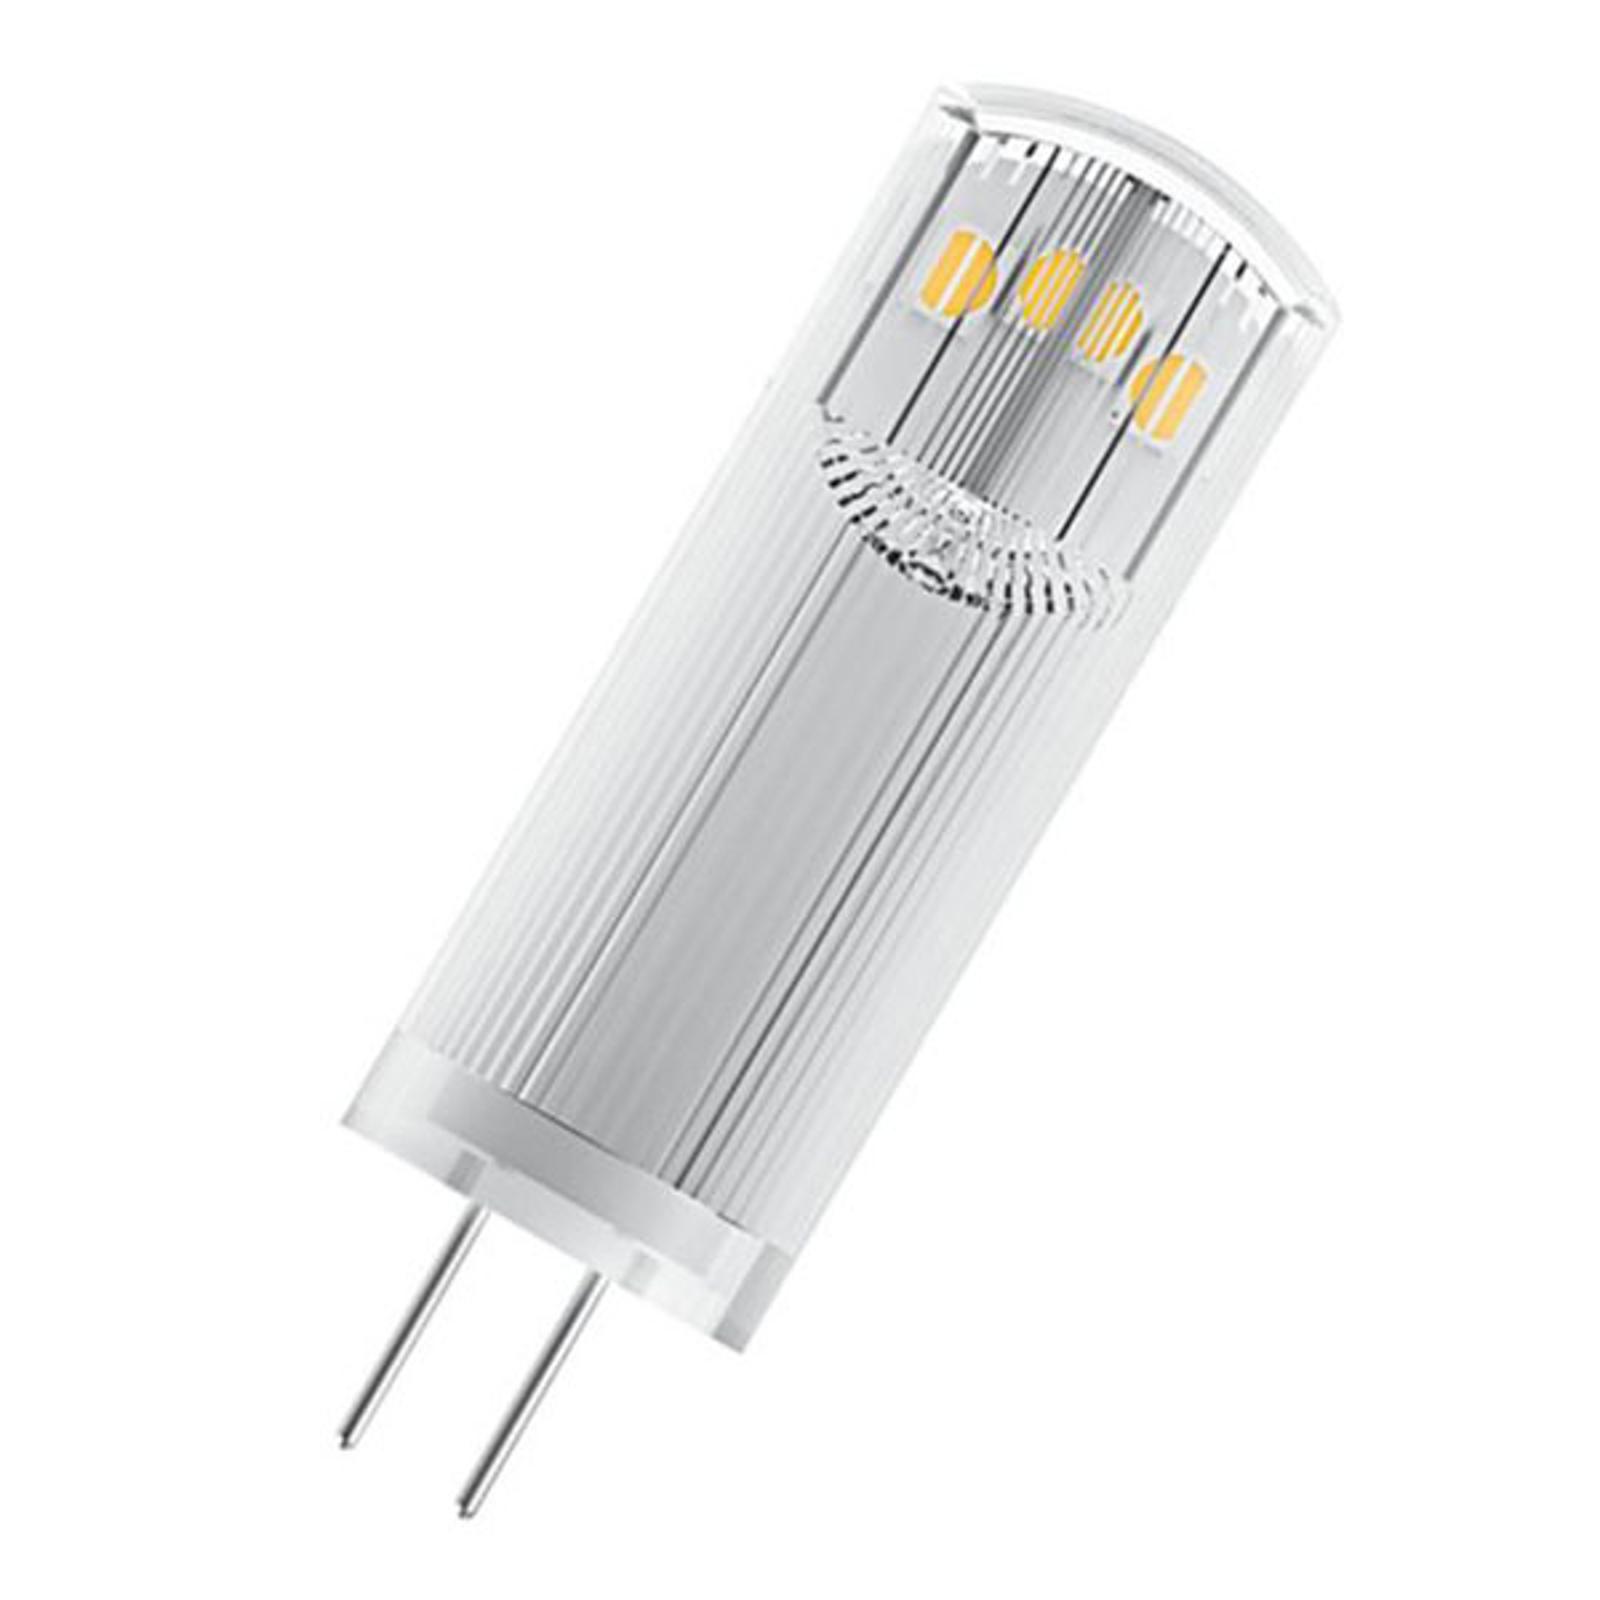 OSRAM LED-Stiftsockellampe G4 1,8W 2.700K klar